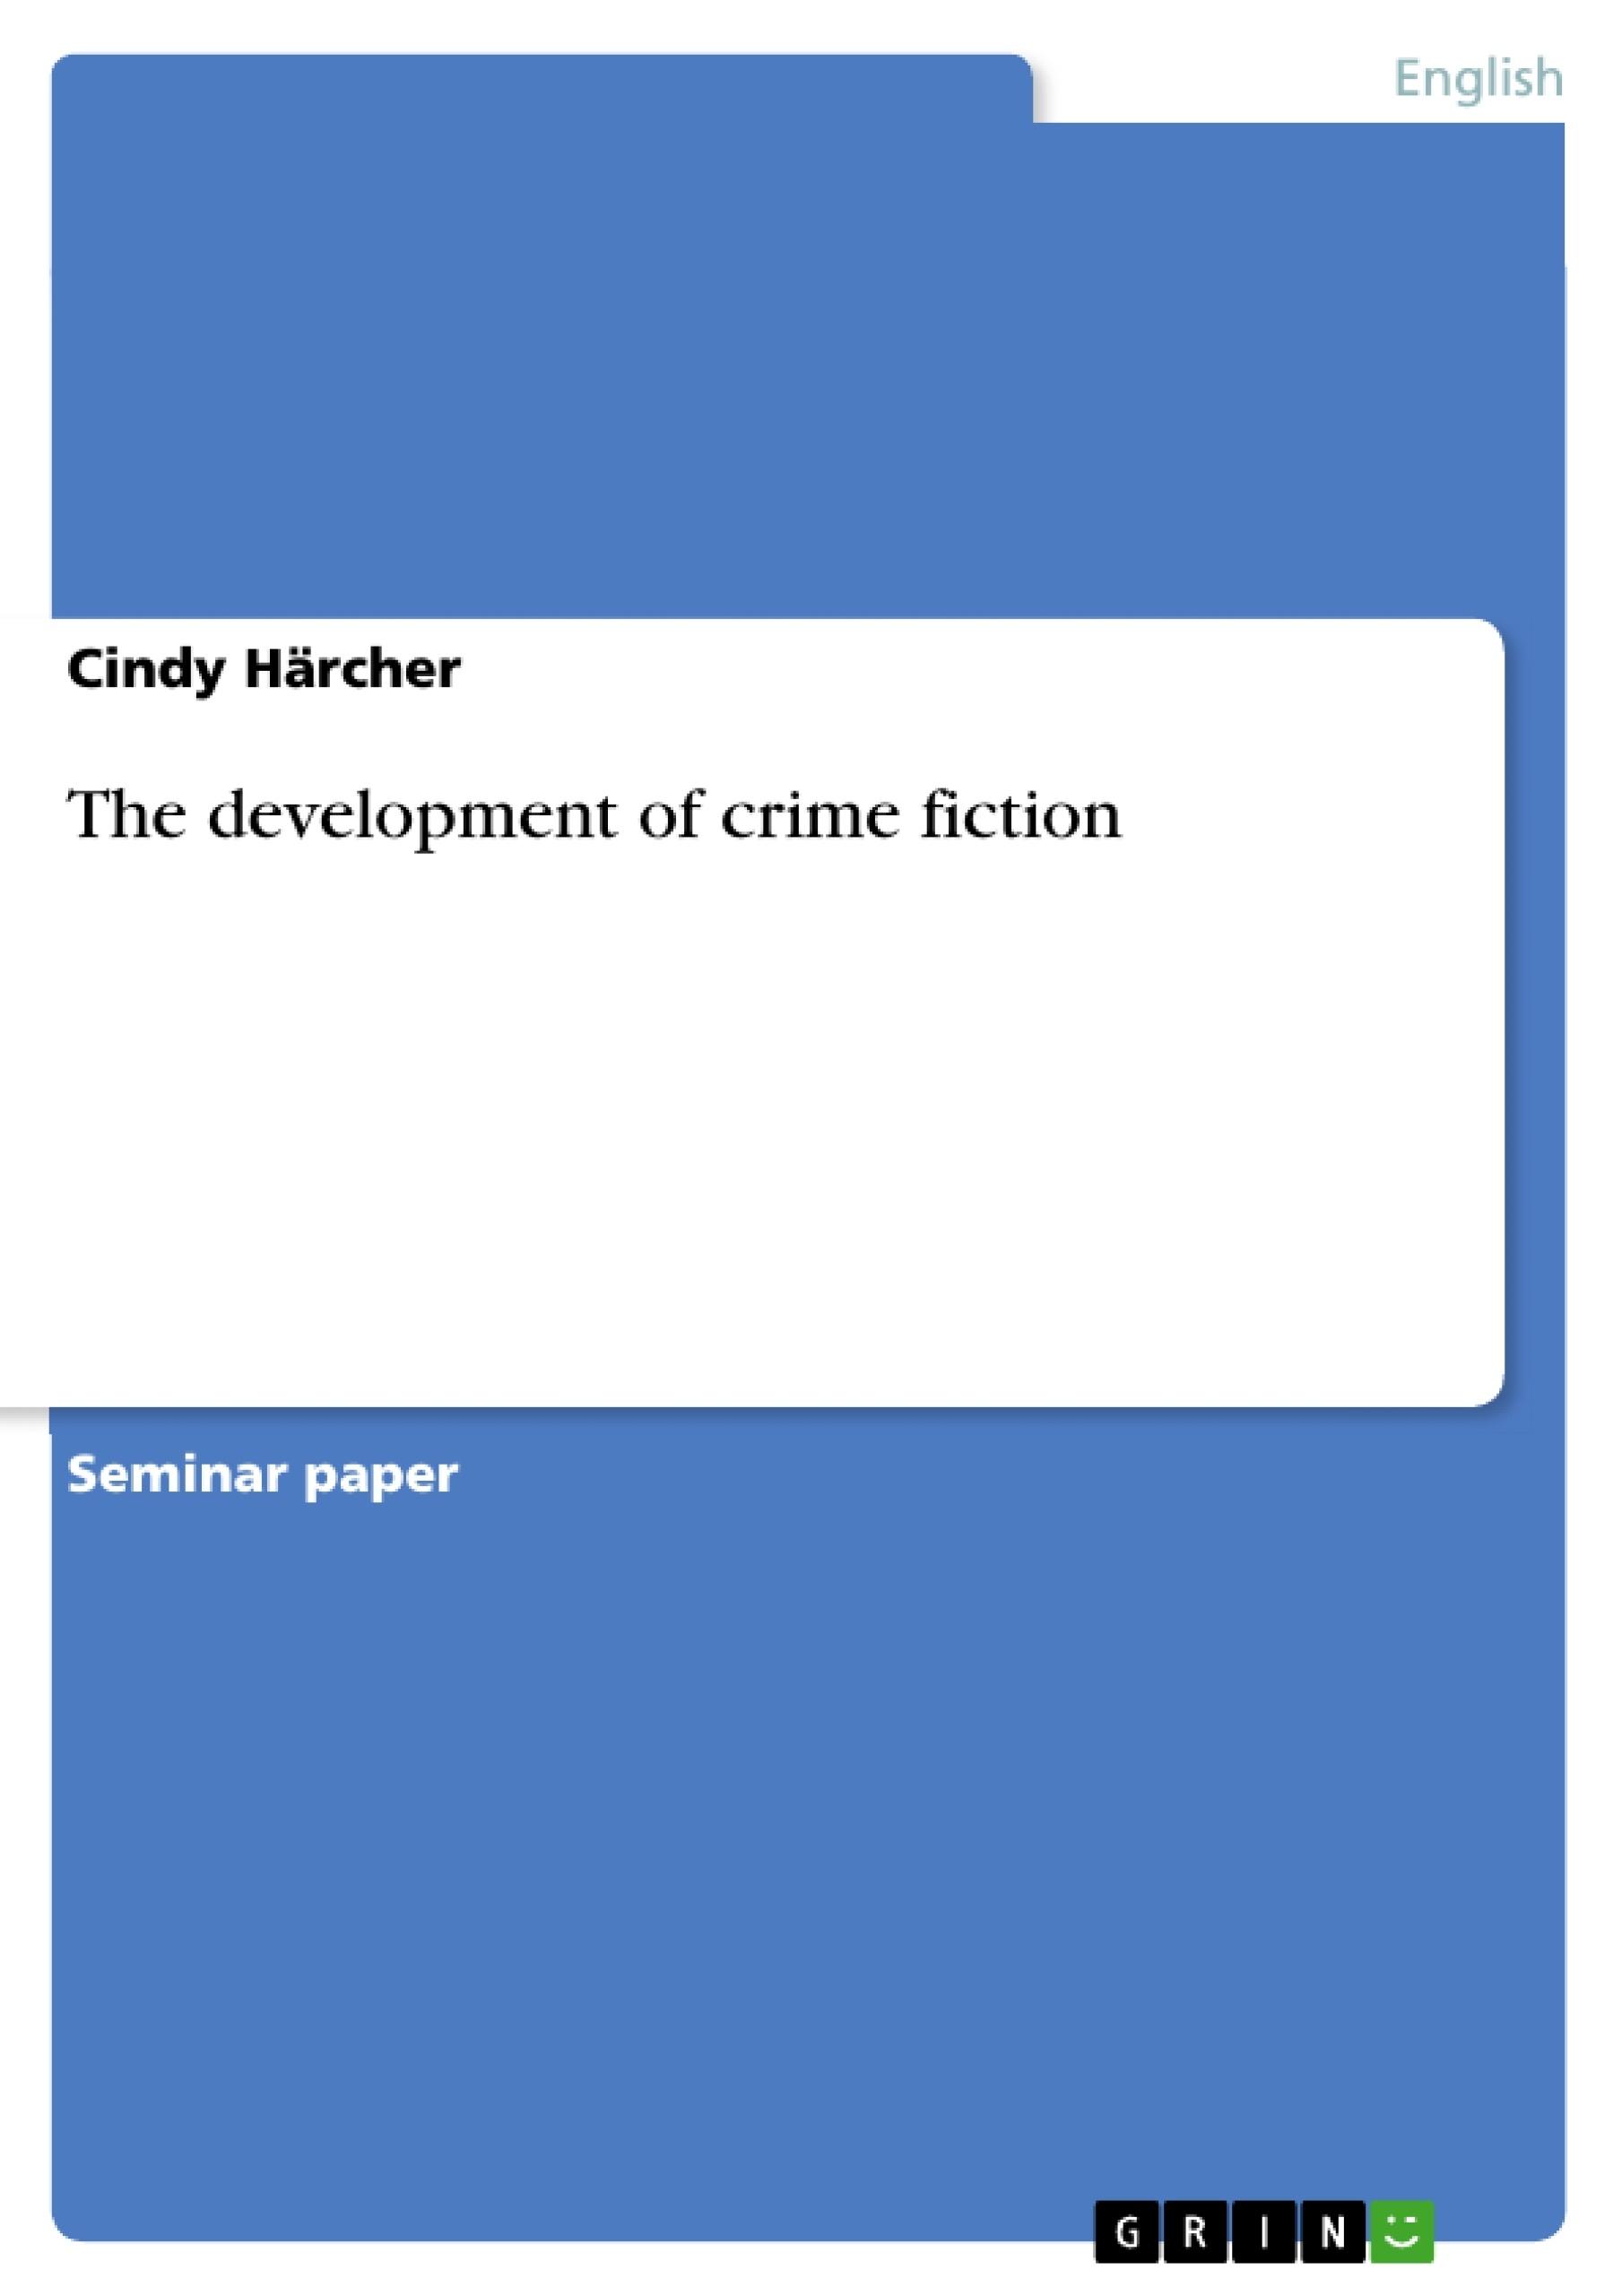 Title: The development of crime fiction